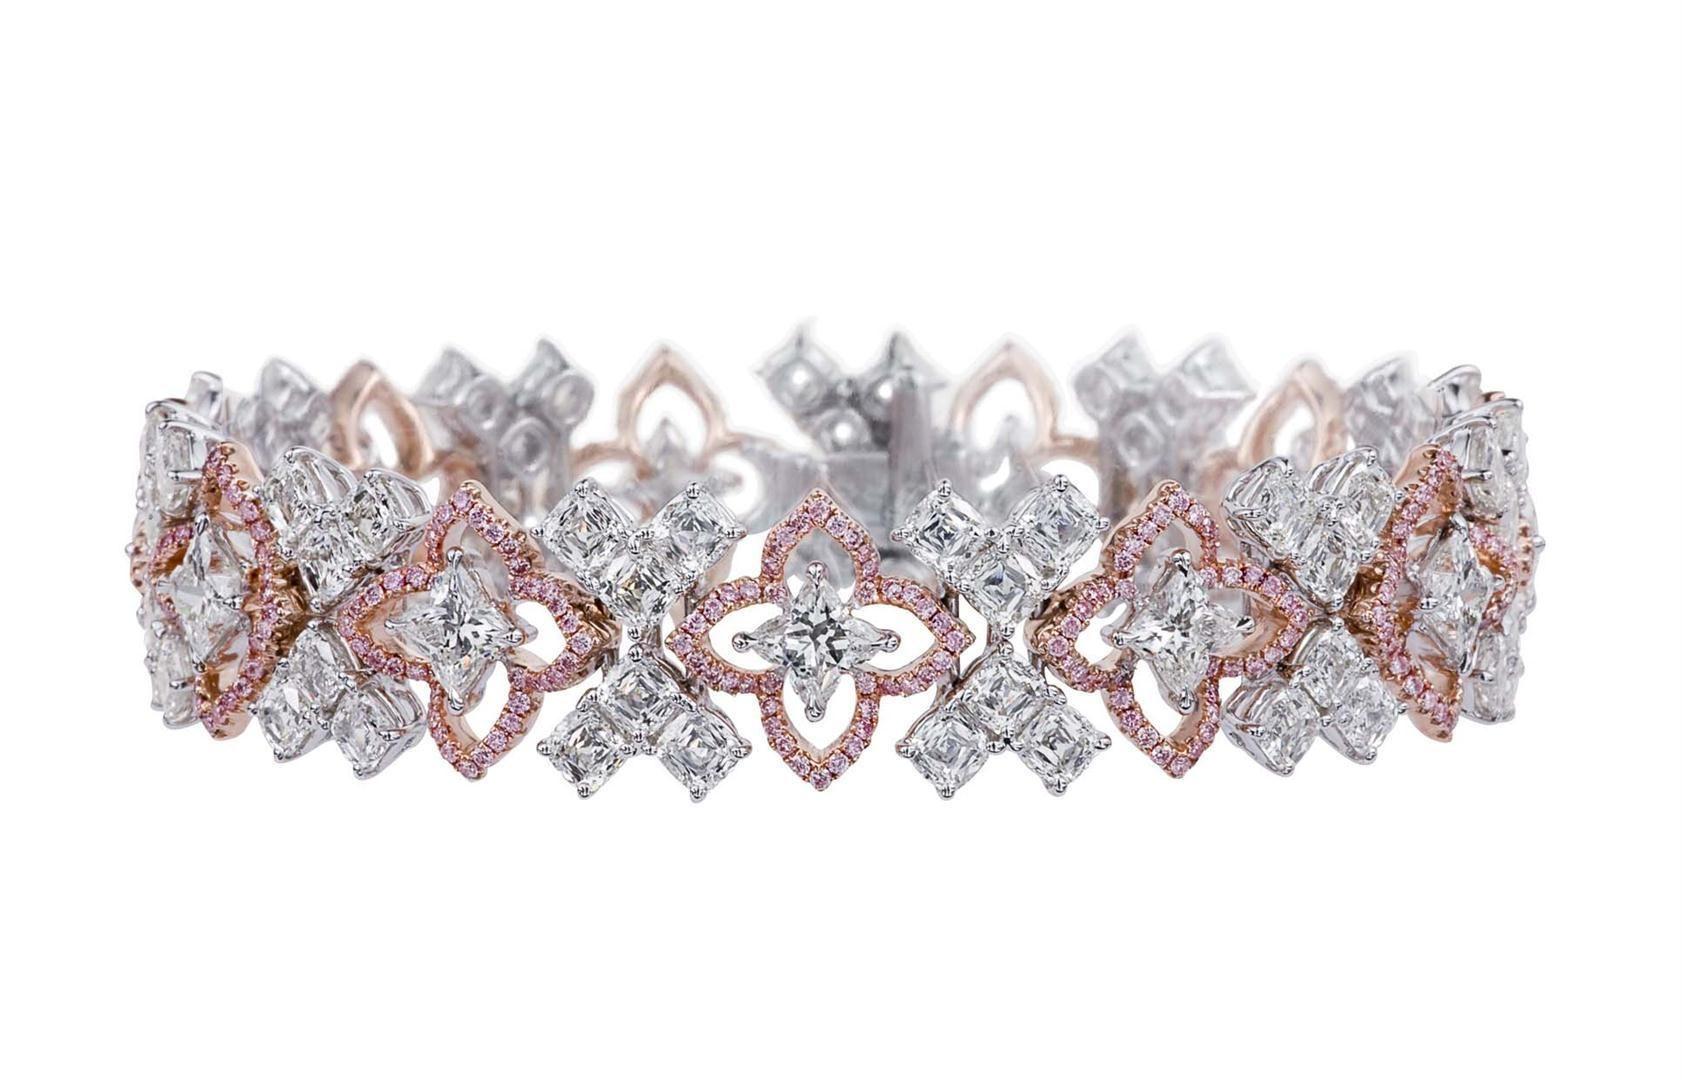 Orchidea Cut® Bracelet by Lili Jewelry #beauty #love #diamonds #lilidiamonds #orchidea